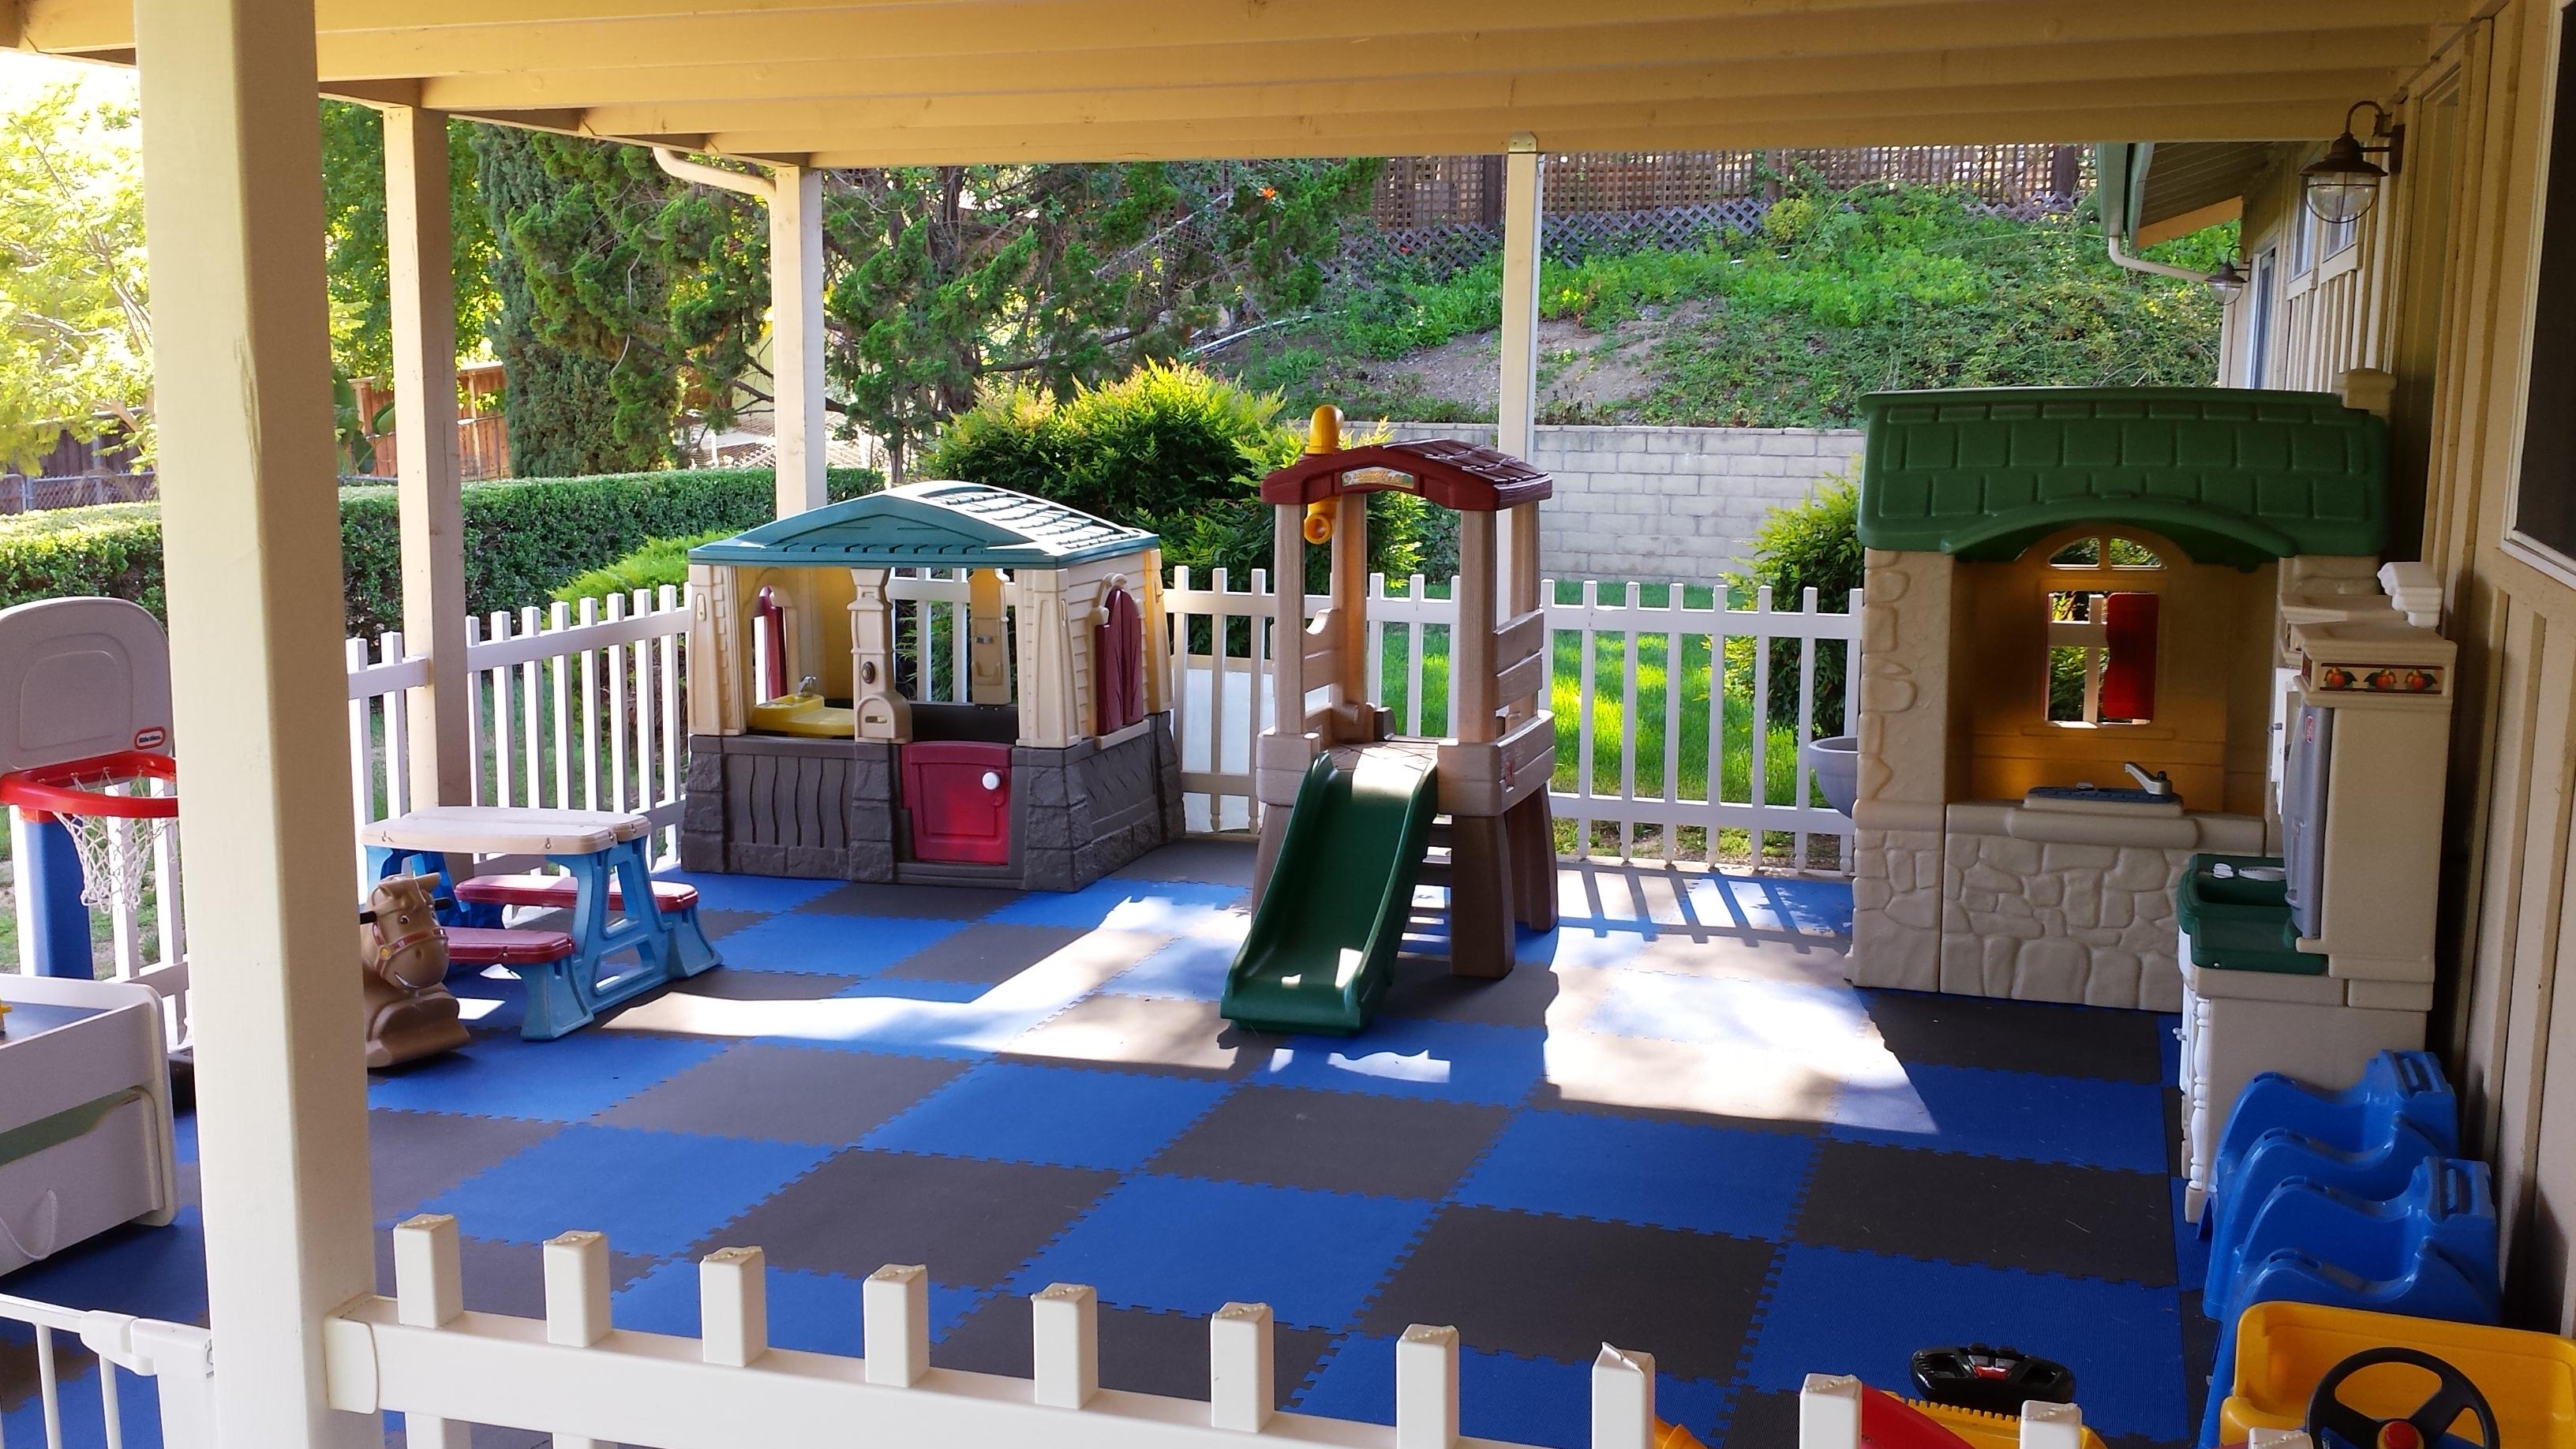 daycare6